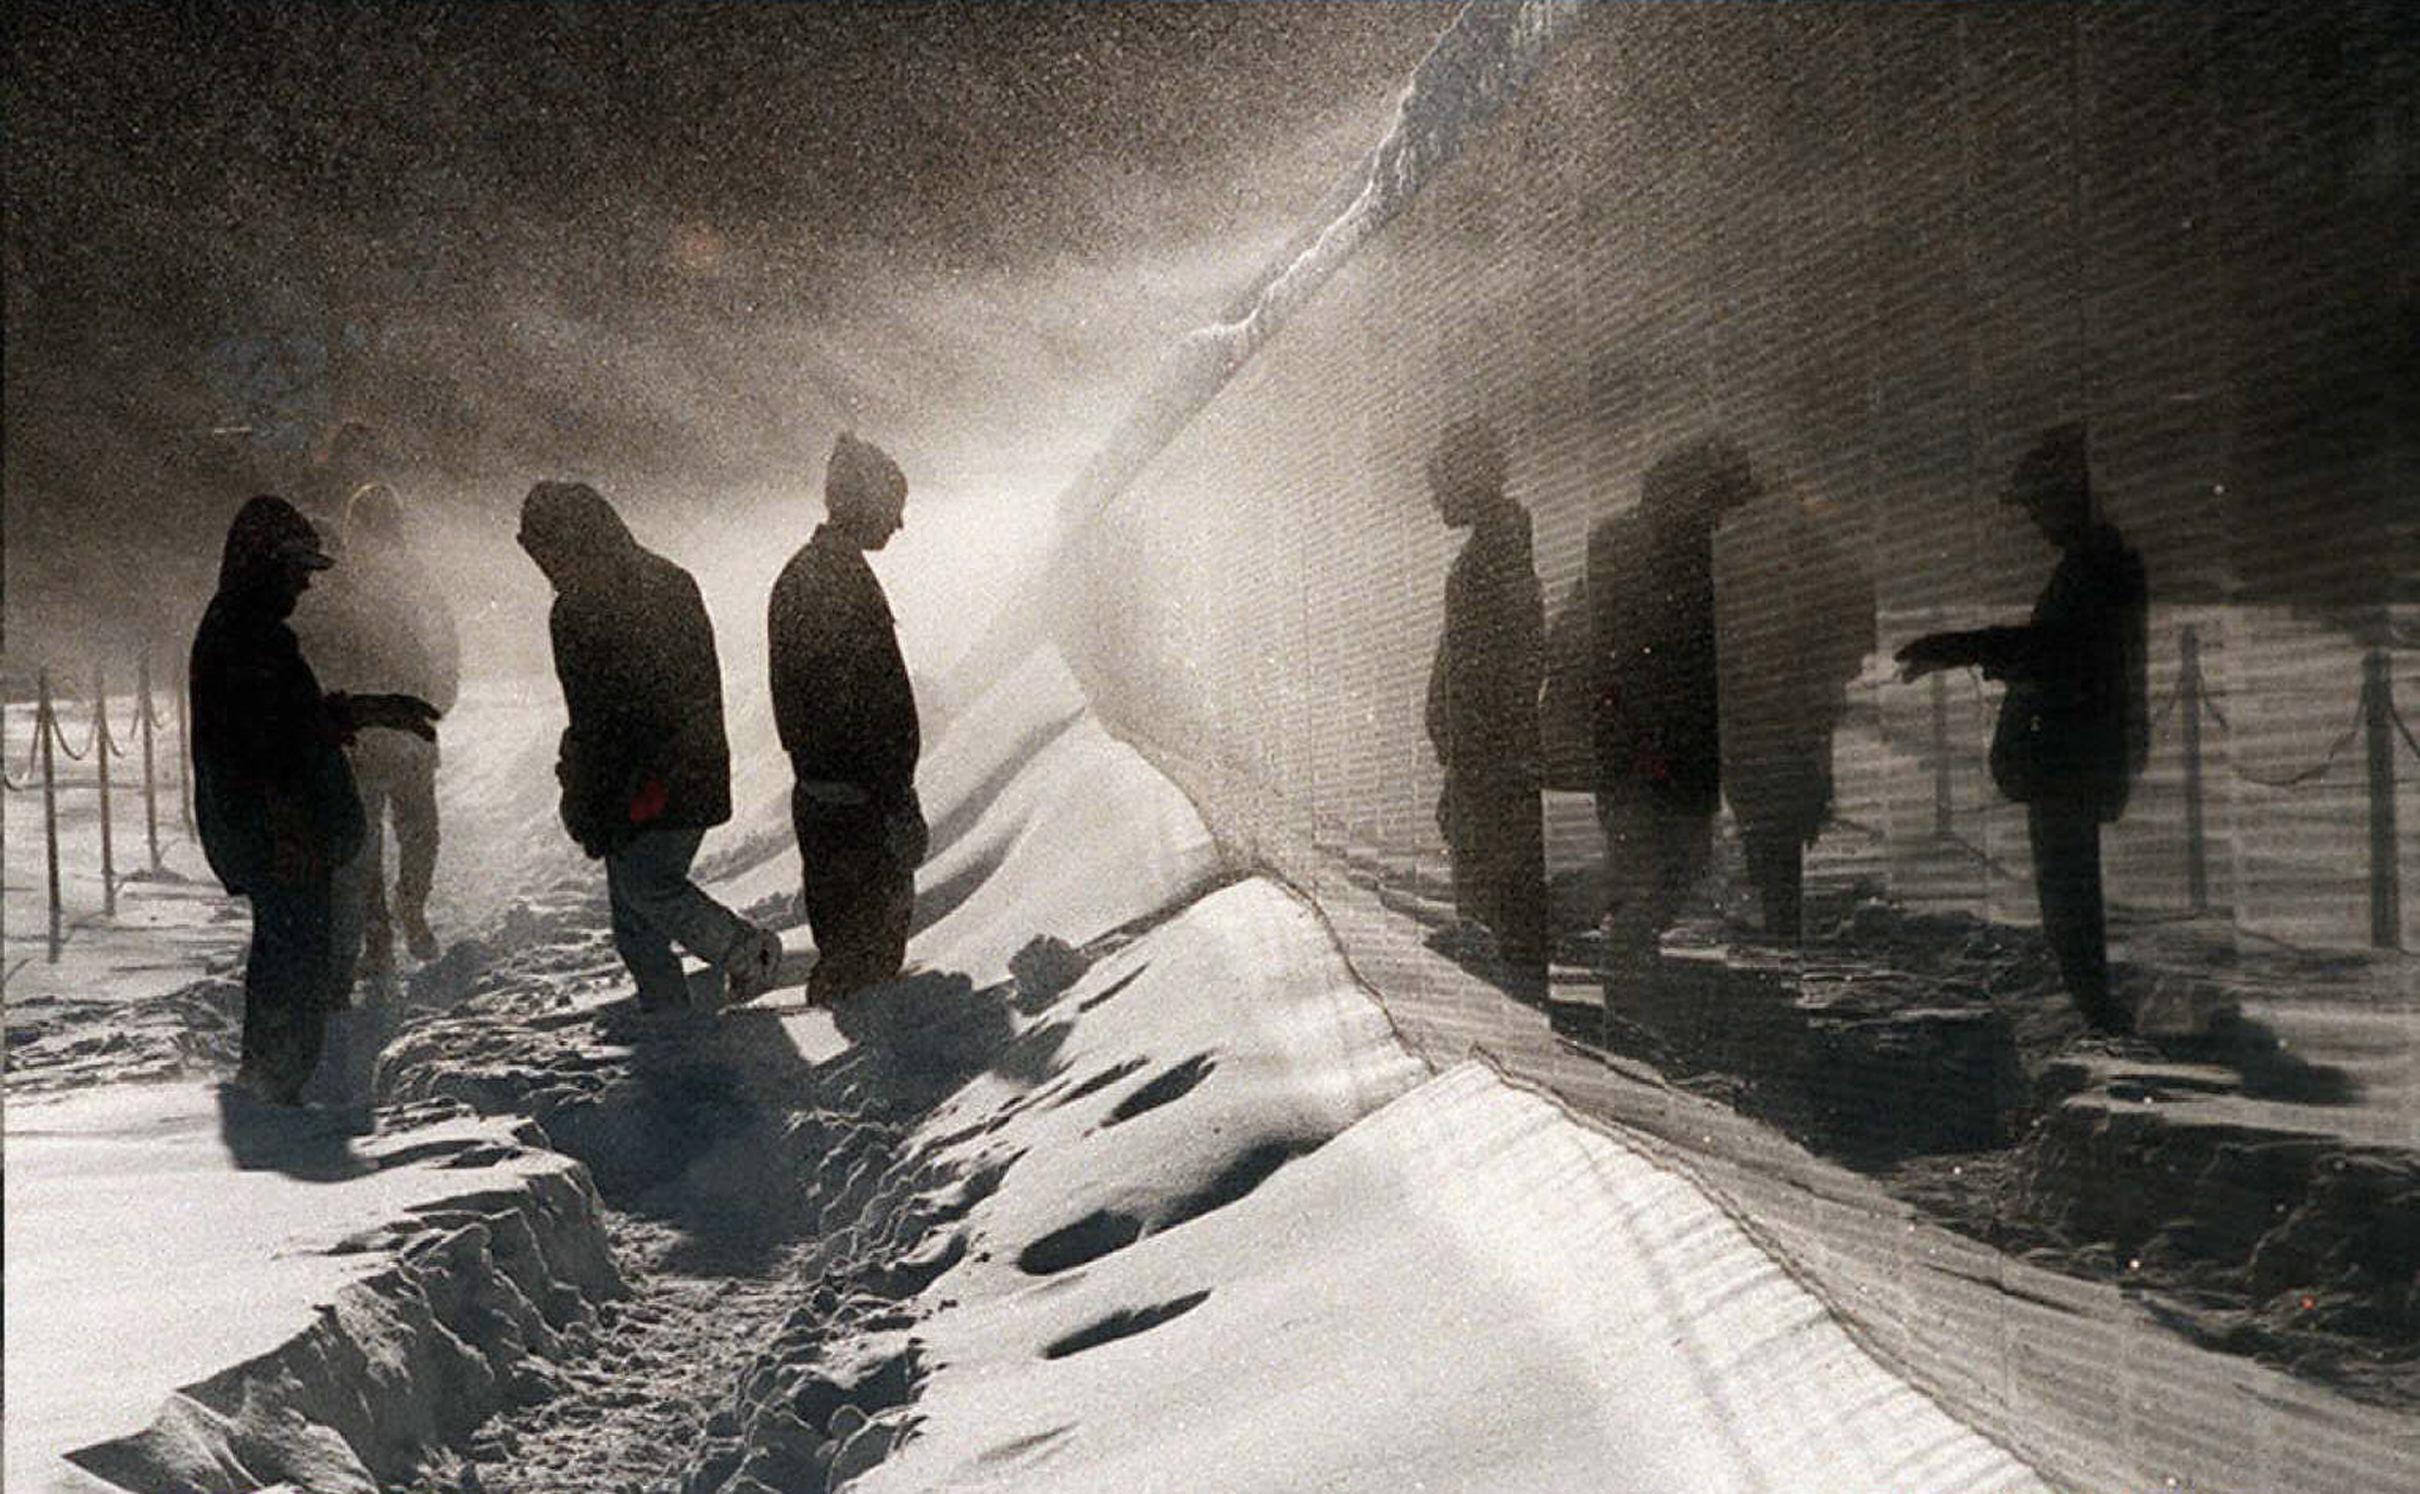 Vietnam War Memorial Snow Blizzard - Photo by Joyce Naltchayan Boghosian